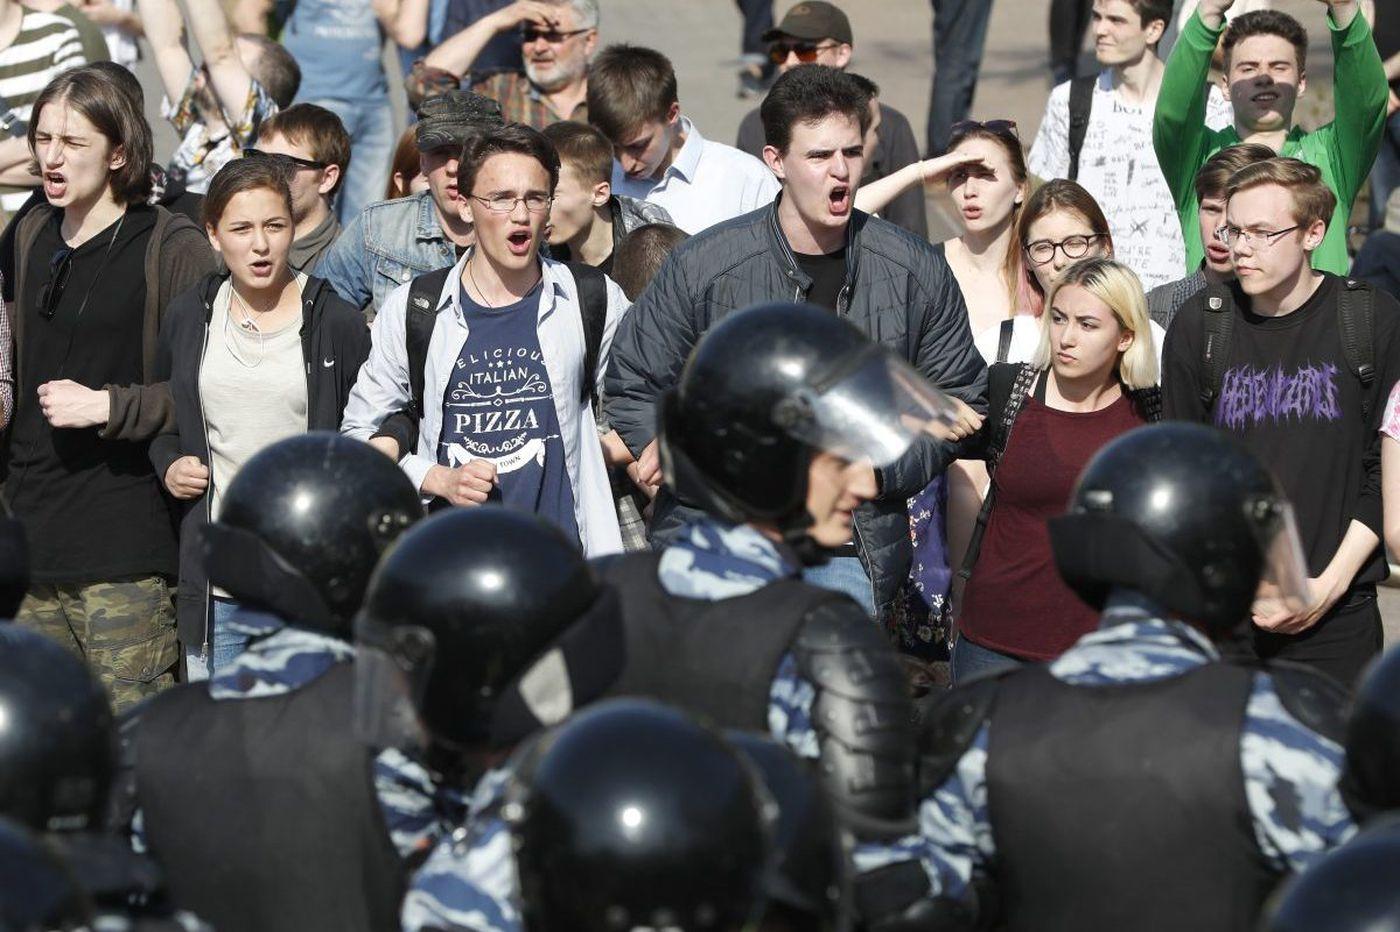 Russia police detain 1,600 protesting Putin's fourth term